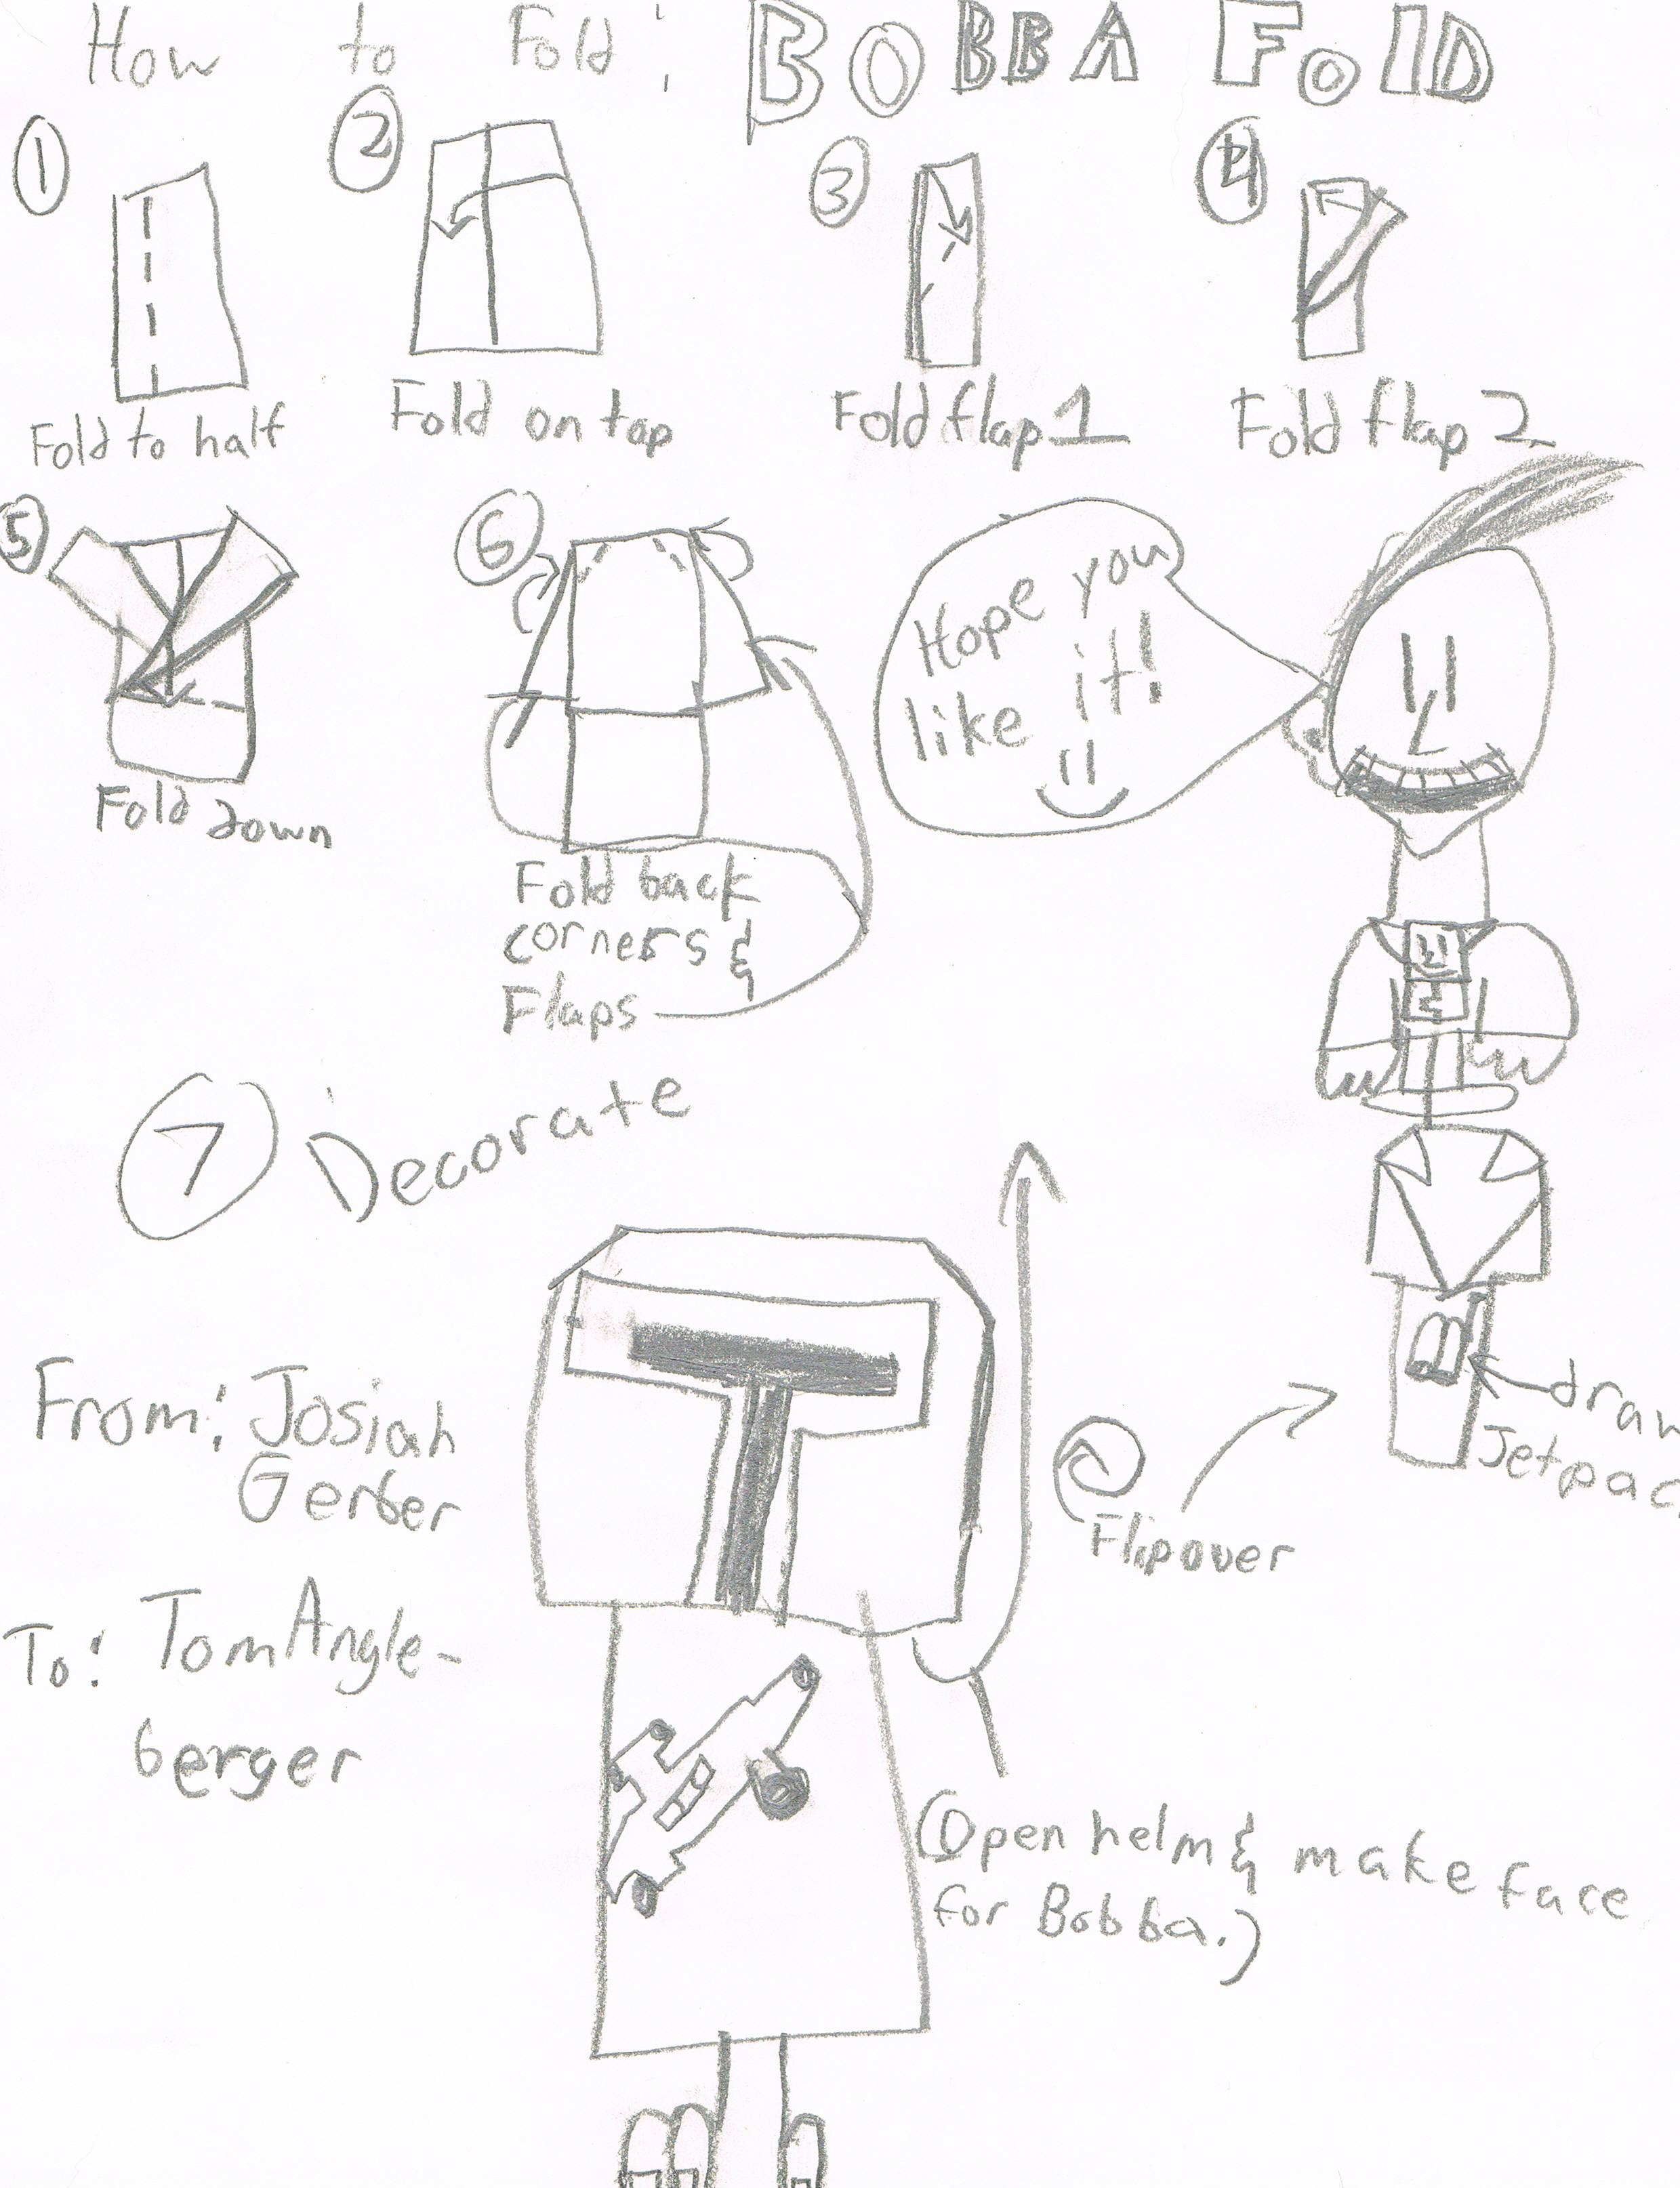 OrigamiYoda | Page 423 - photo#28